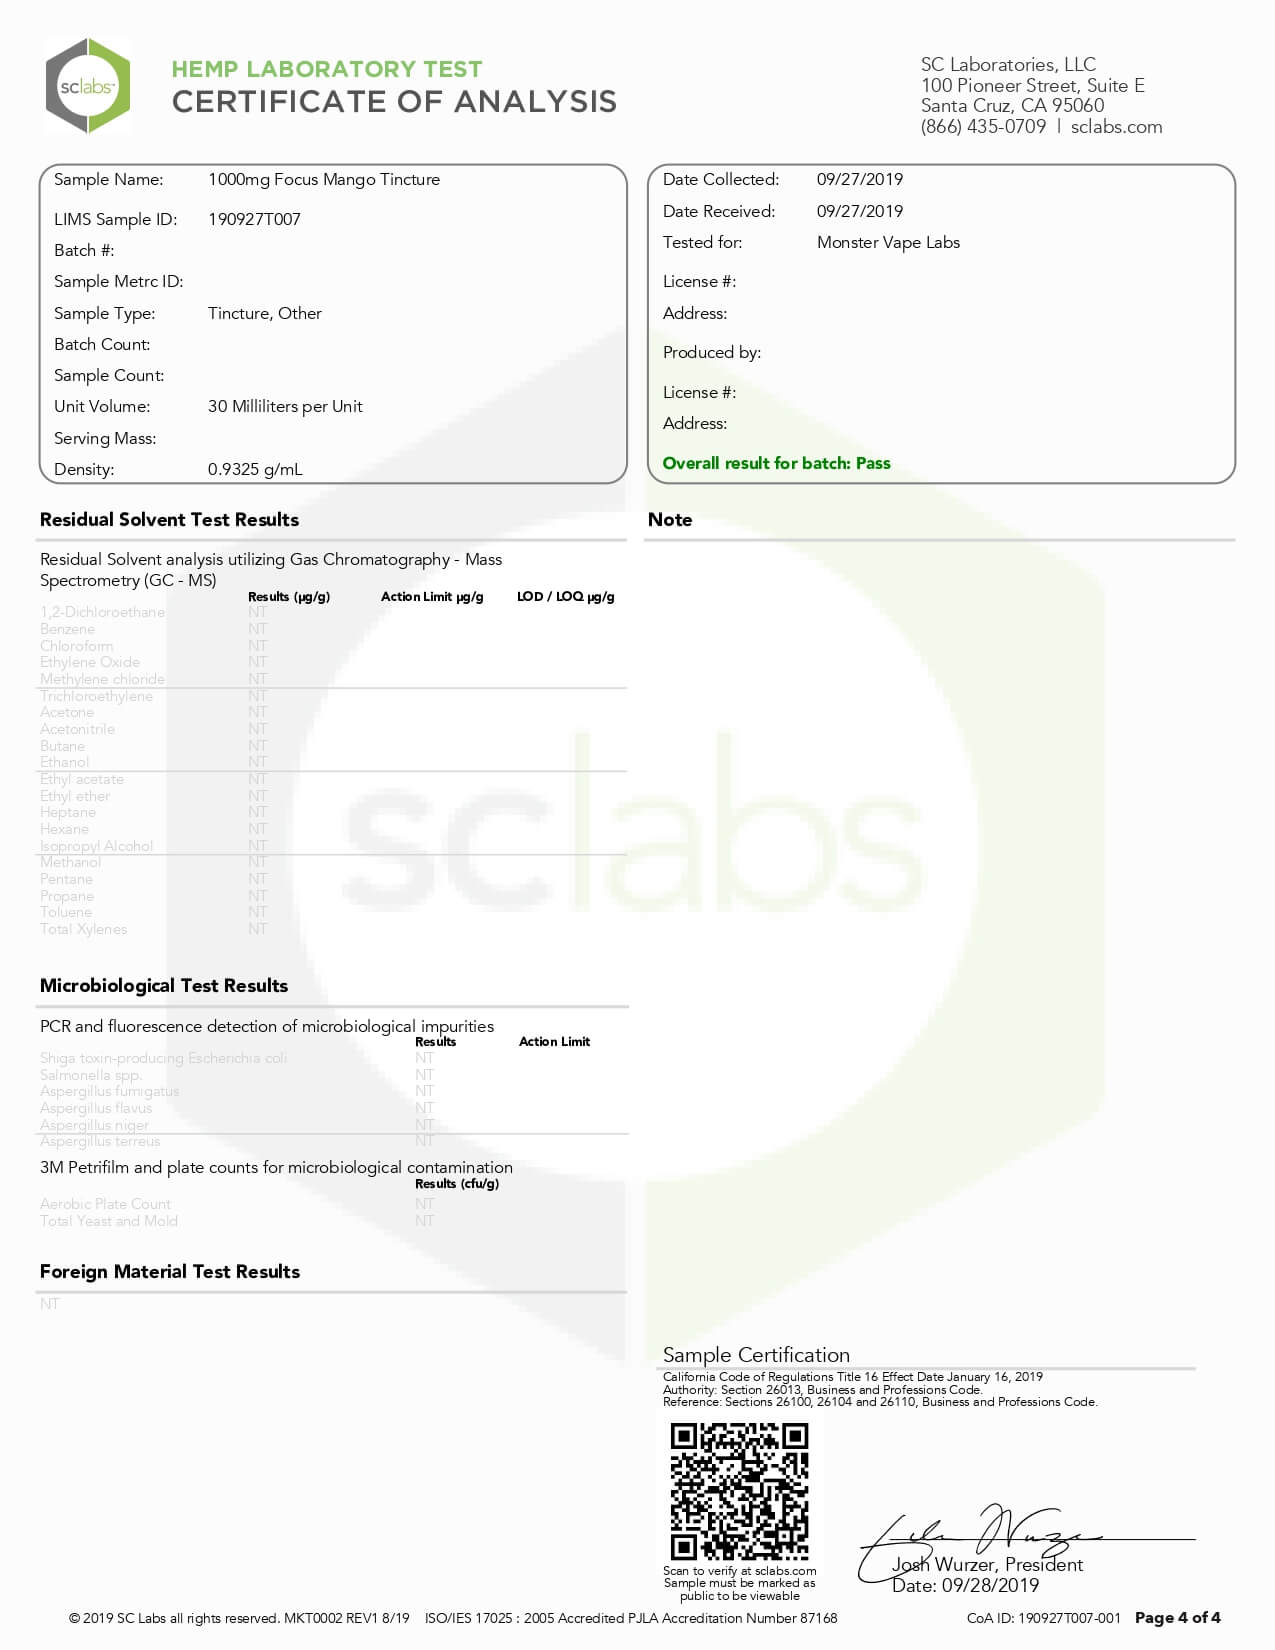 Hempcy CBD Tincture Focus Mango 1000mg Lab Report